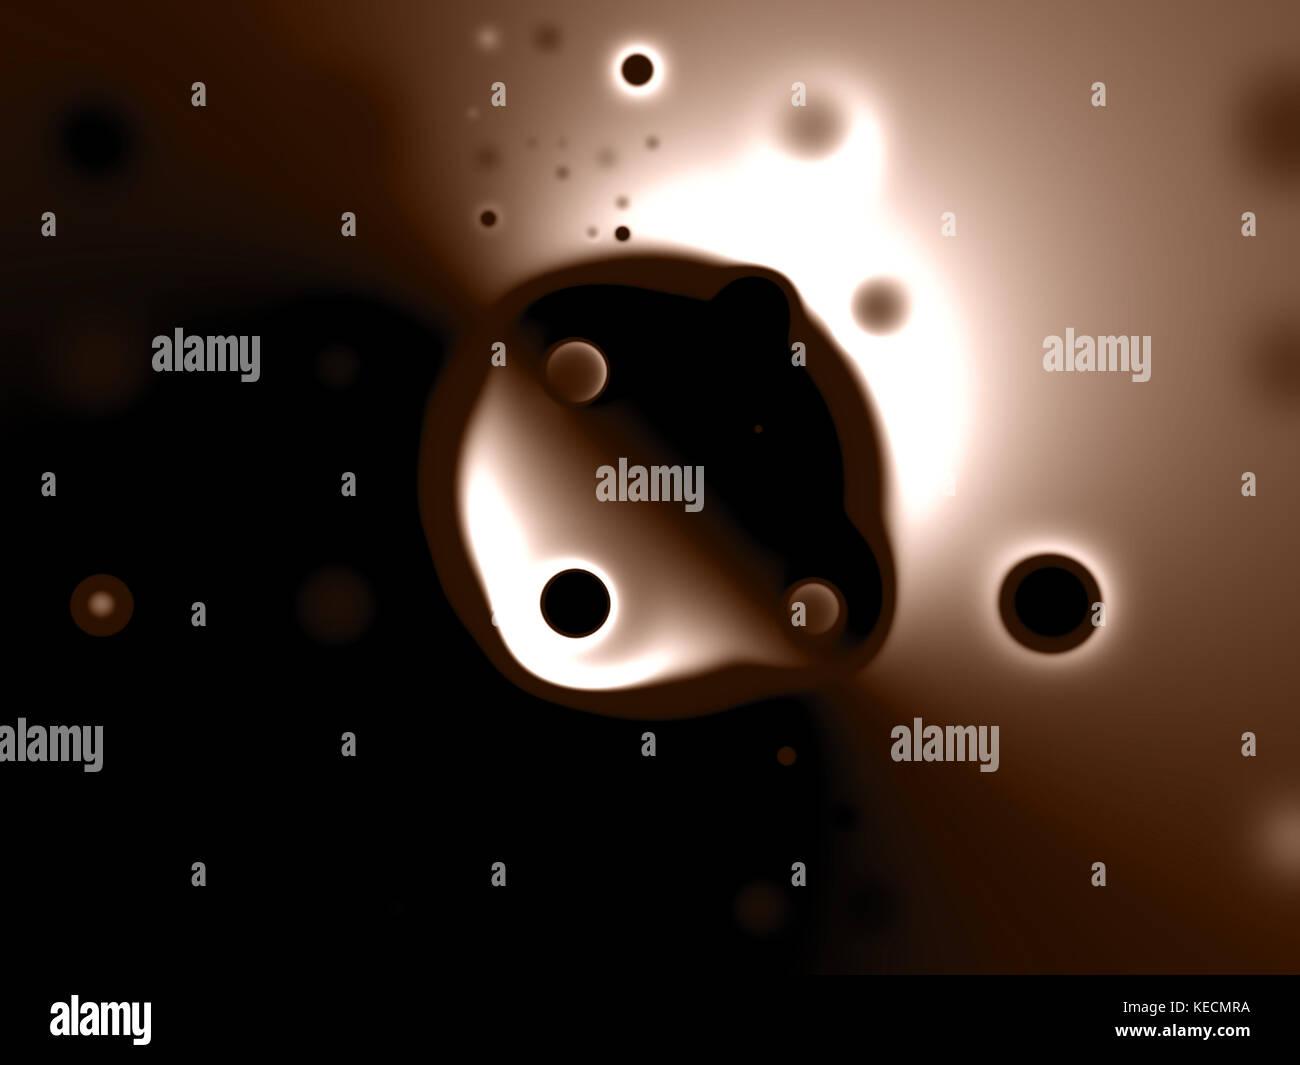 Strange blobs orbiting a darkened planet. - Stock Image